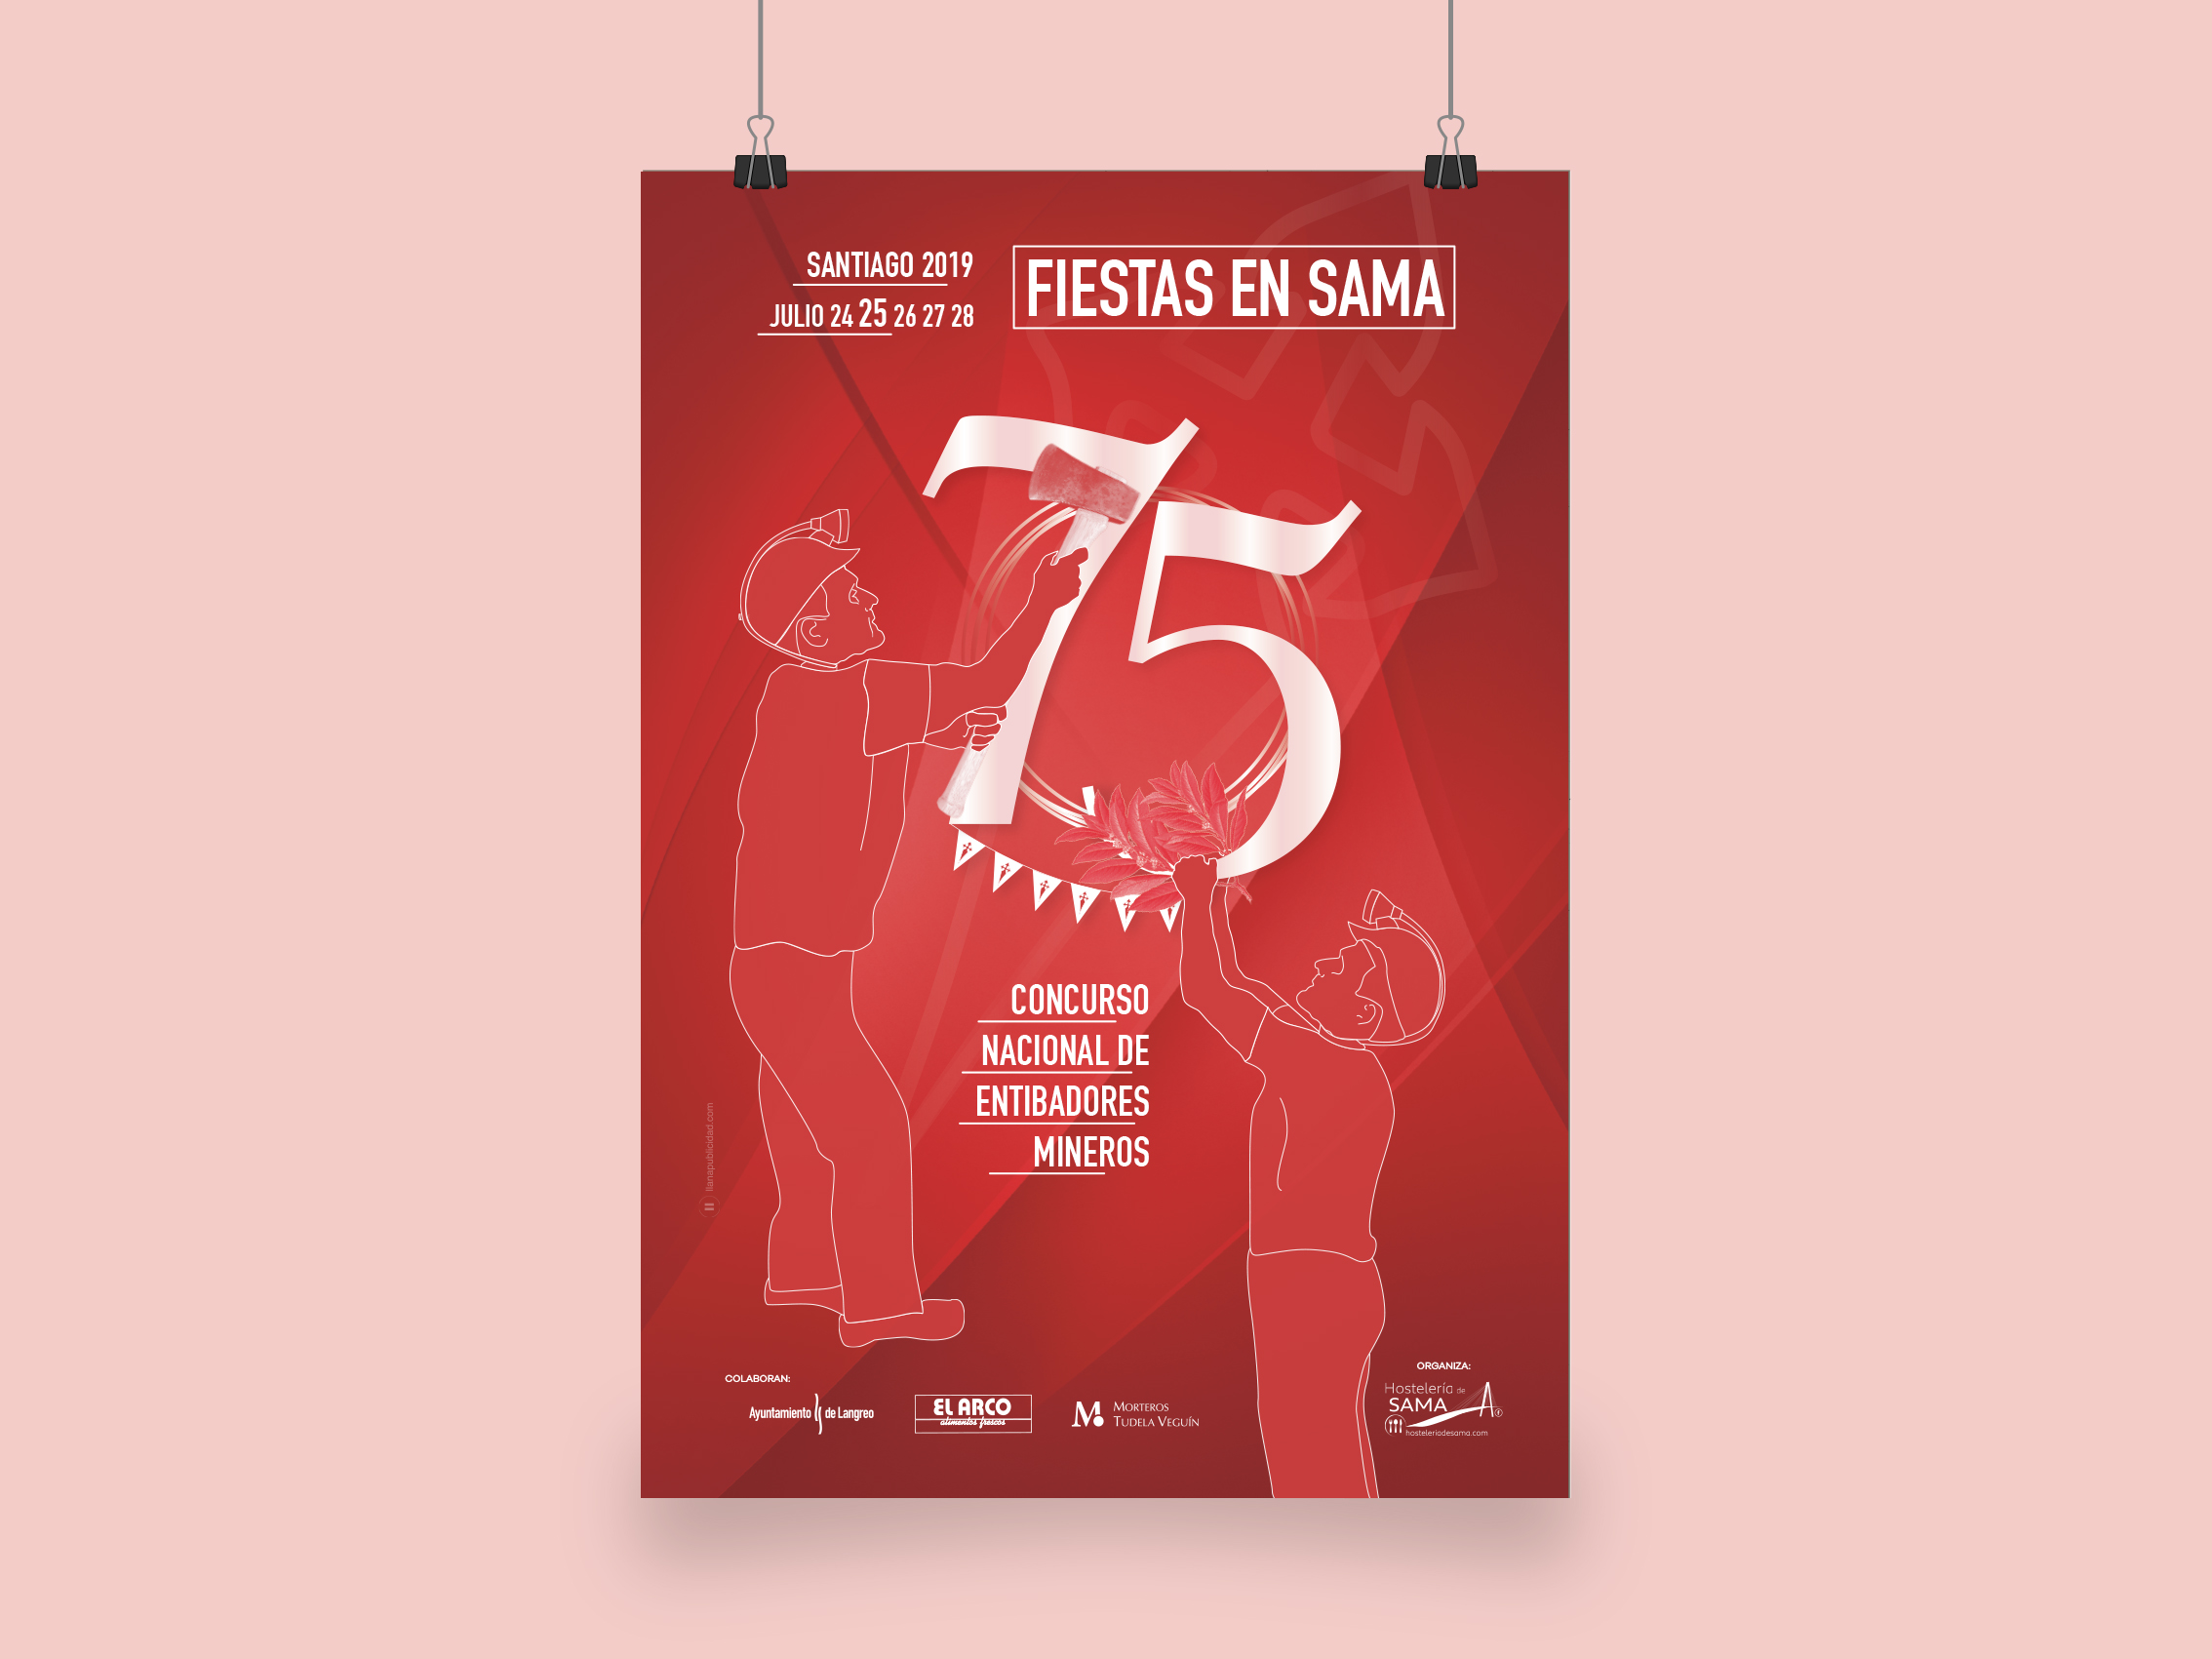 Fiestas Sama Langreo 2019